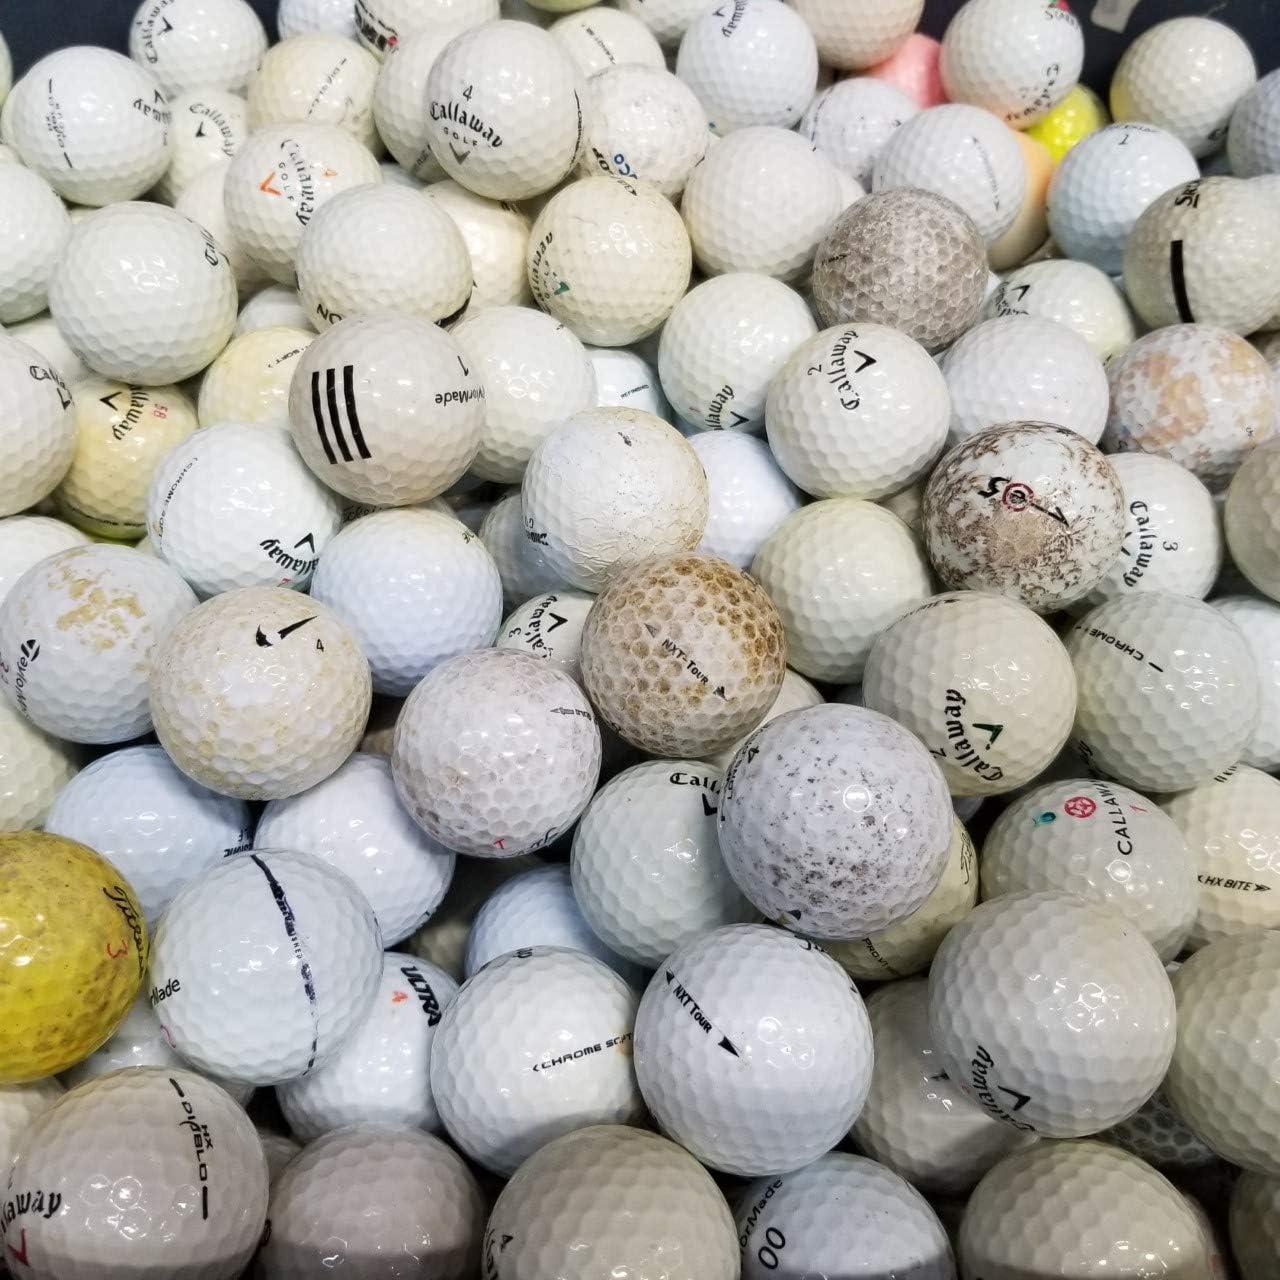 38++ Amazon prime used golf balls information